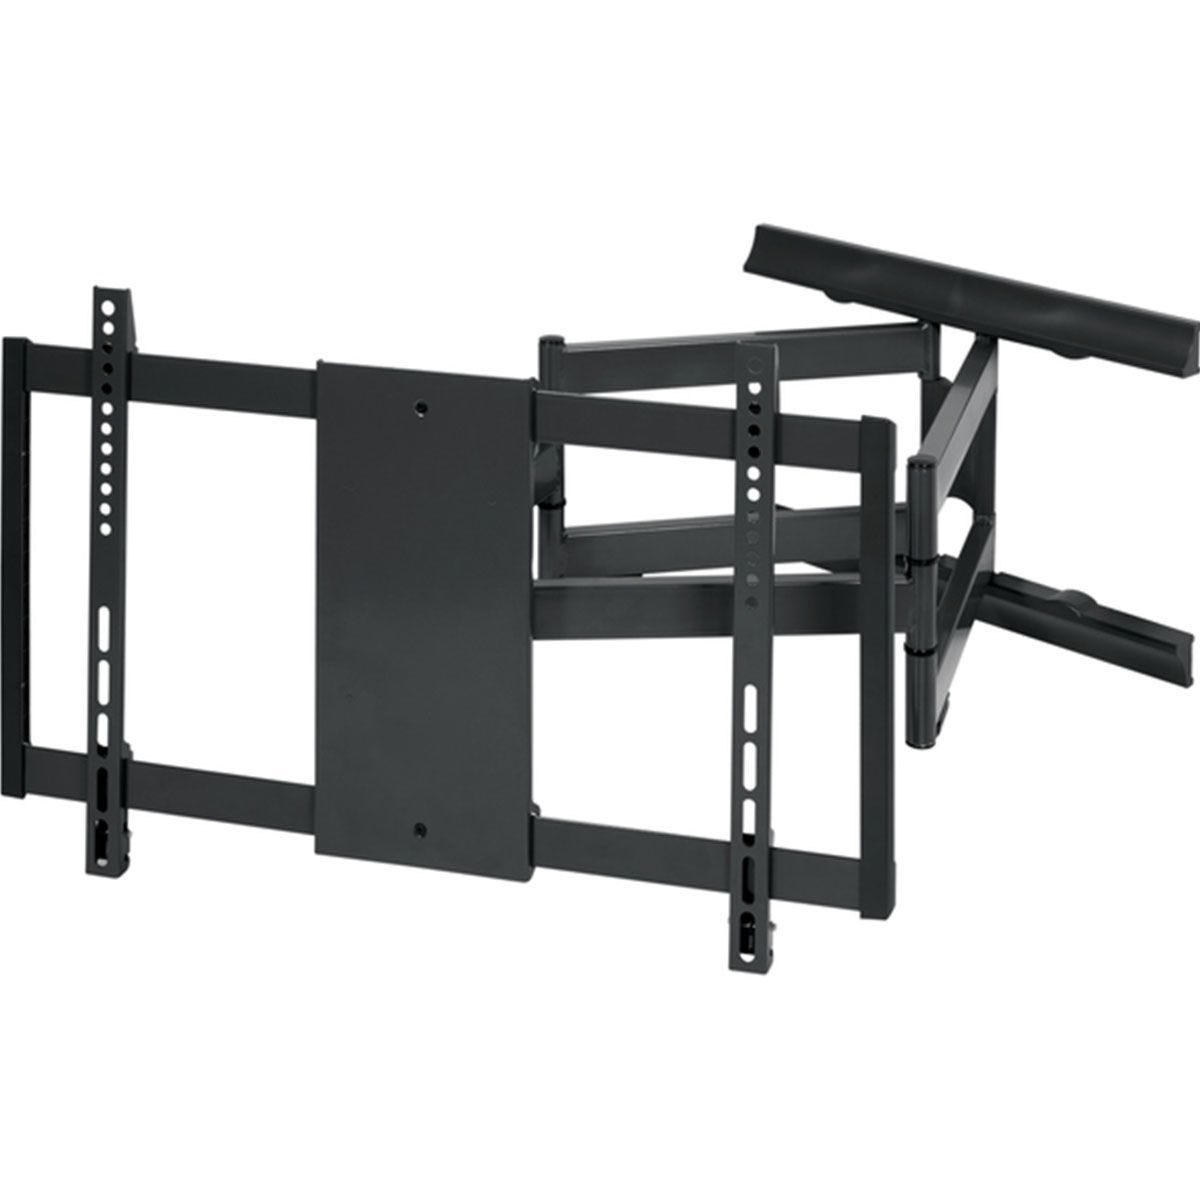 Vivanco BFMO 8860 Titan Full Motion TV Wallmount 85